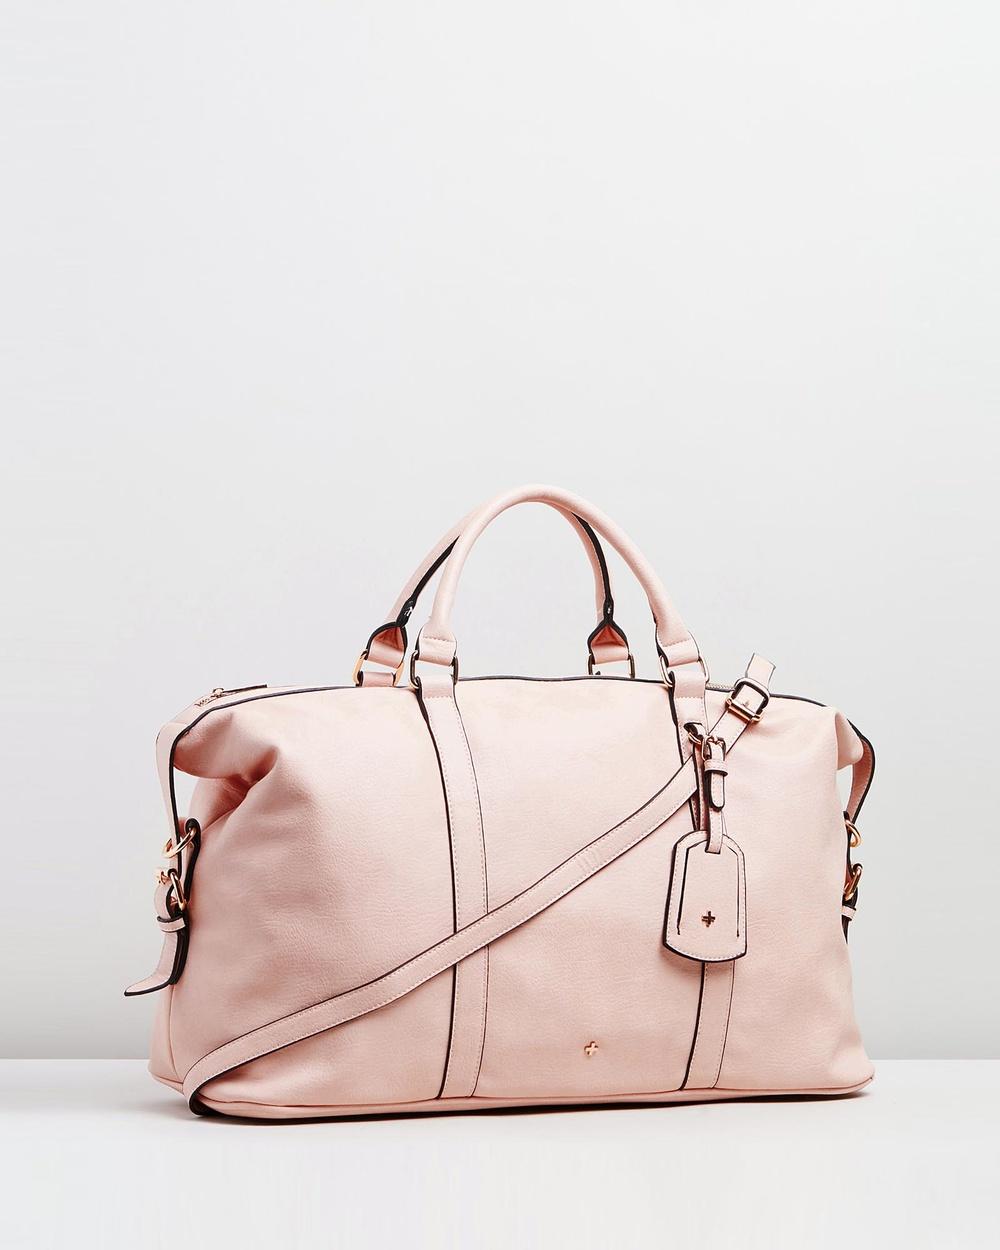 PETA AND JAIN Reagan Weekender Bag Clutches Pink